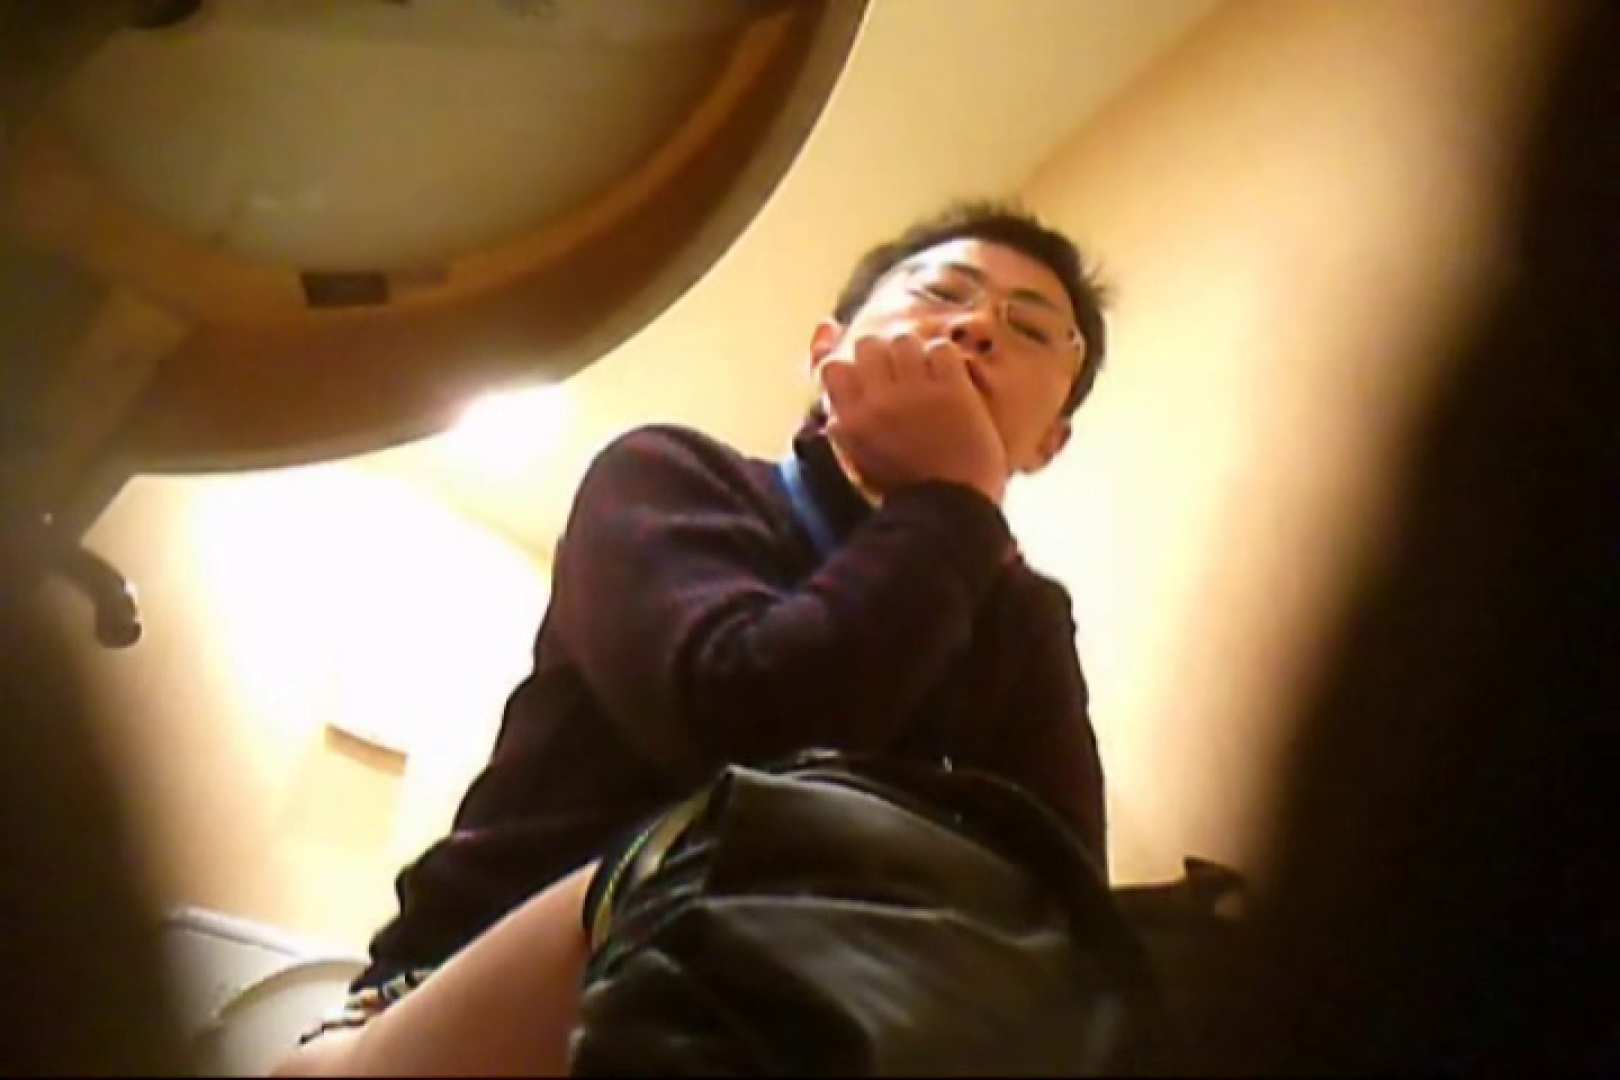 Gボーイ初投稿!掴み取りさんの洗面所覗き!in新幹線!VOL.13 着物 ゲイセックス画像 56枚 19